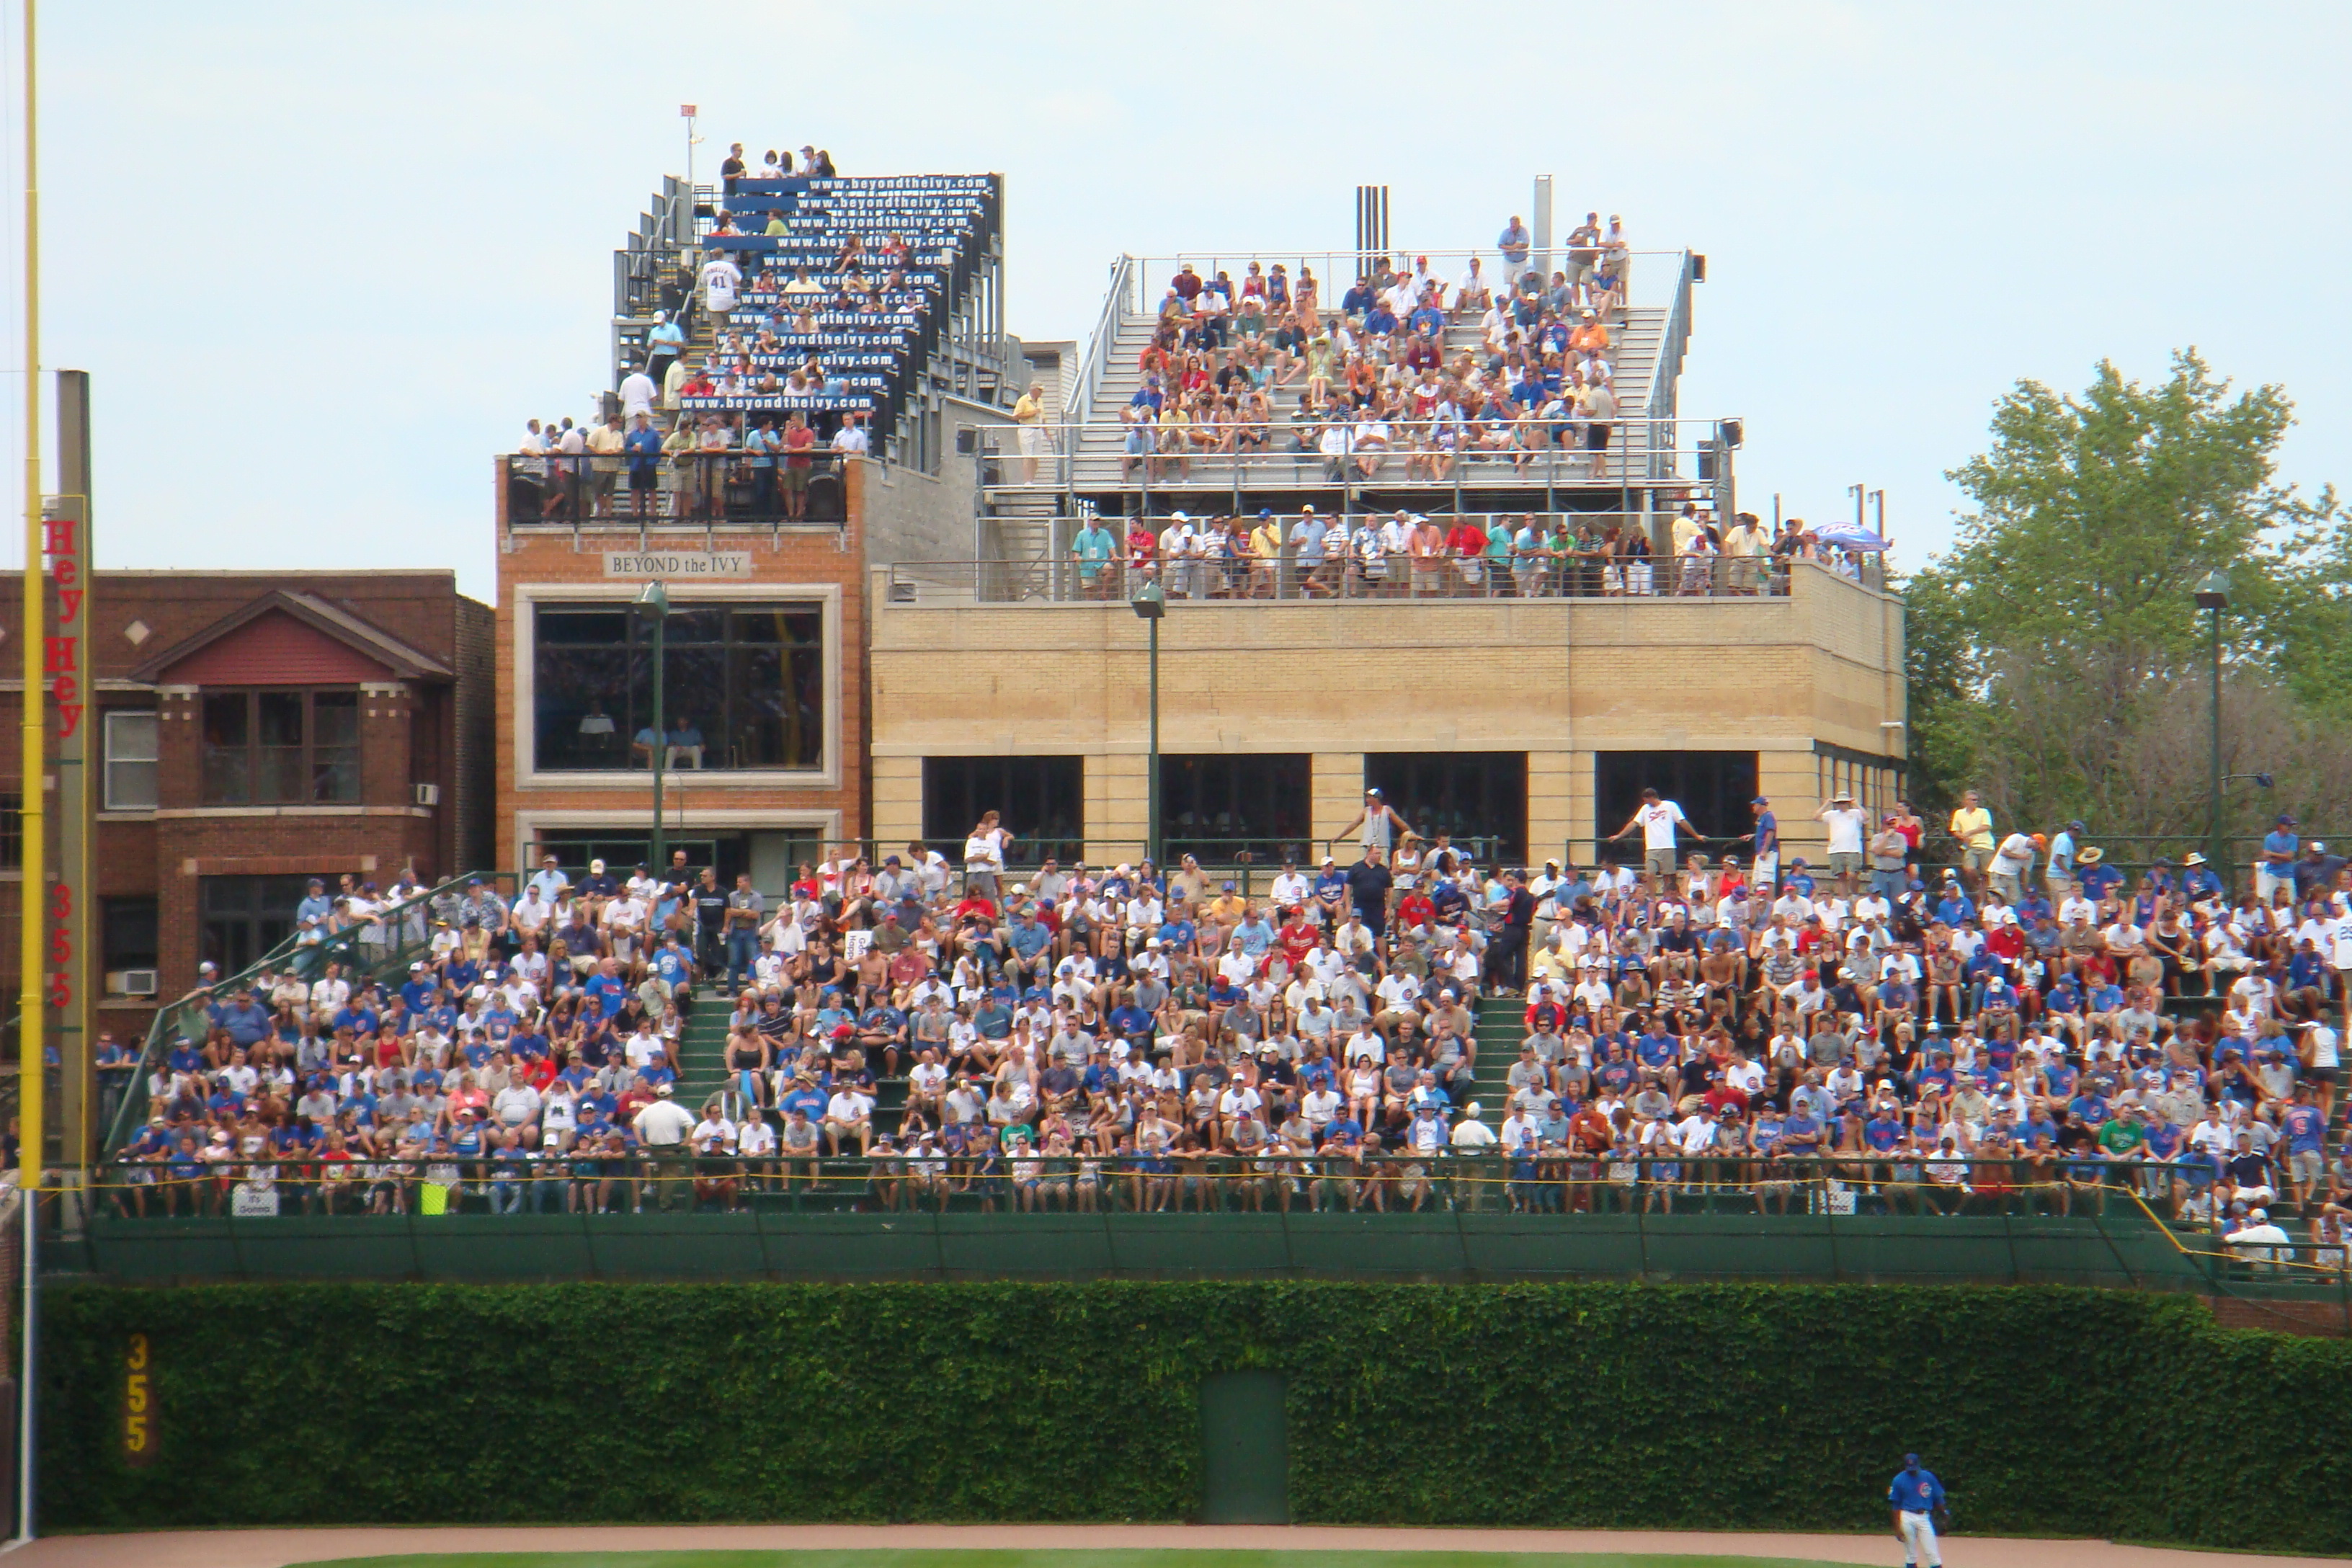 Fan Pictures at Wrigley Field Wrigley Field – Cubs Fans